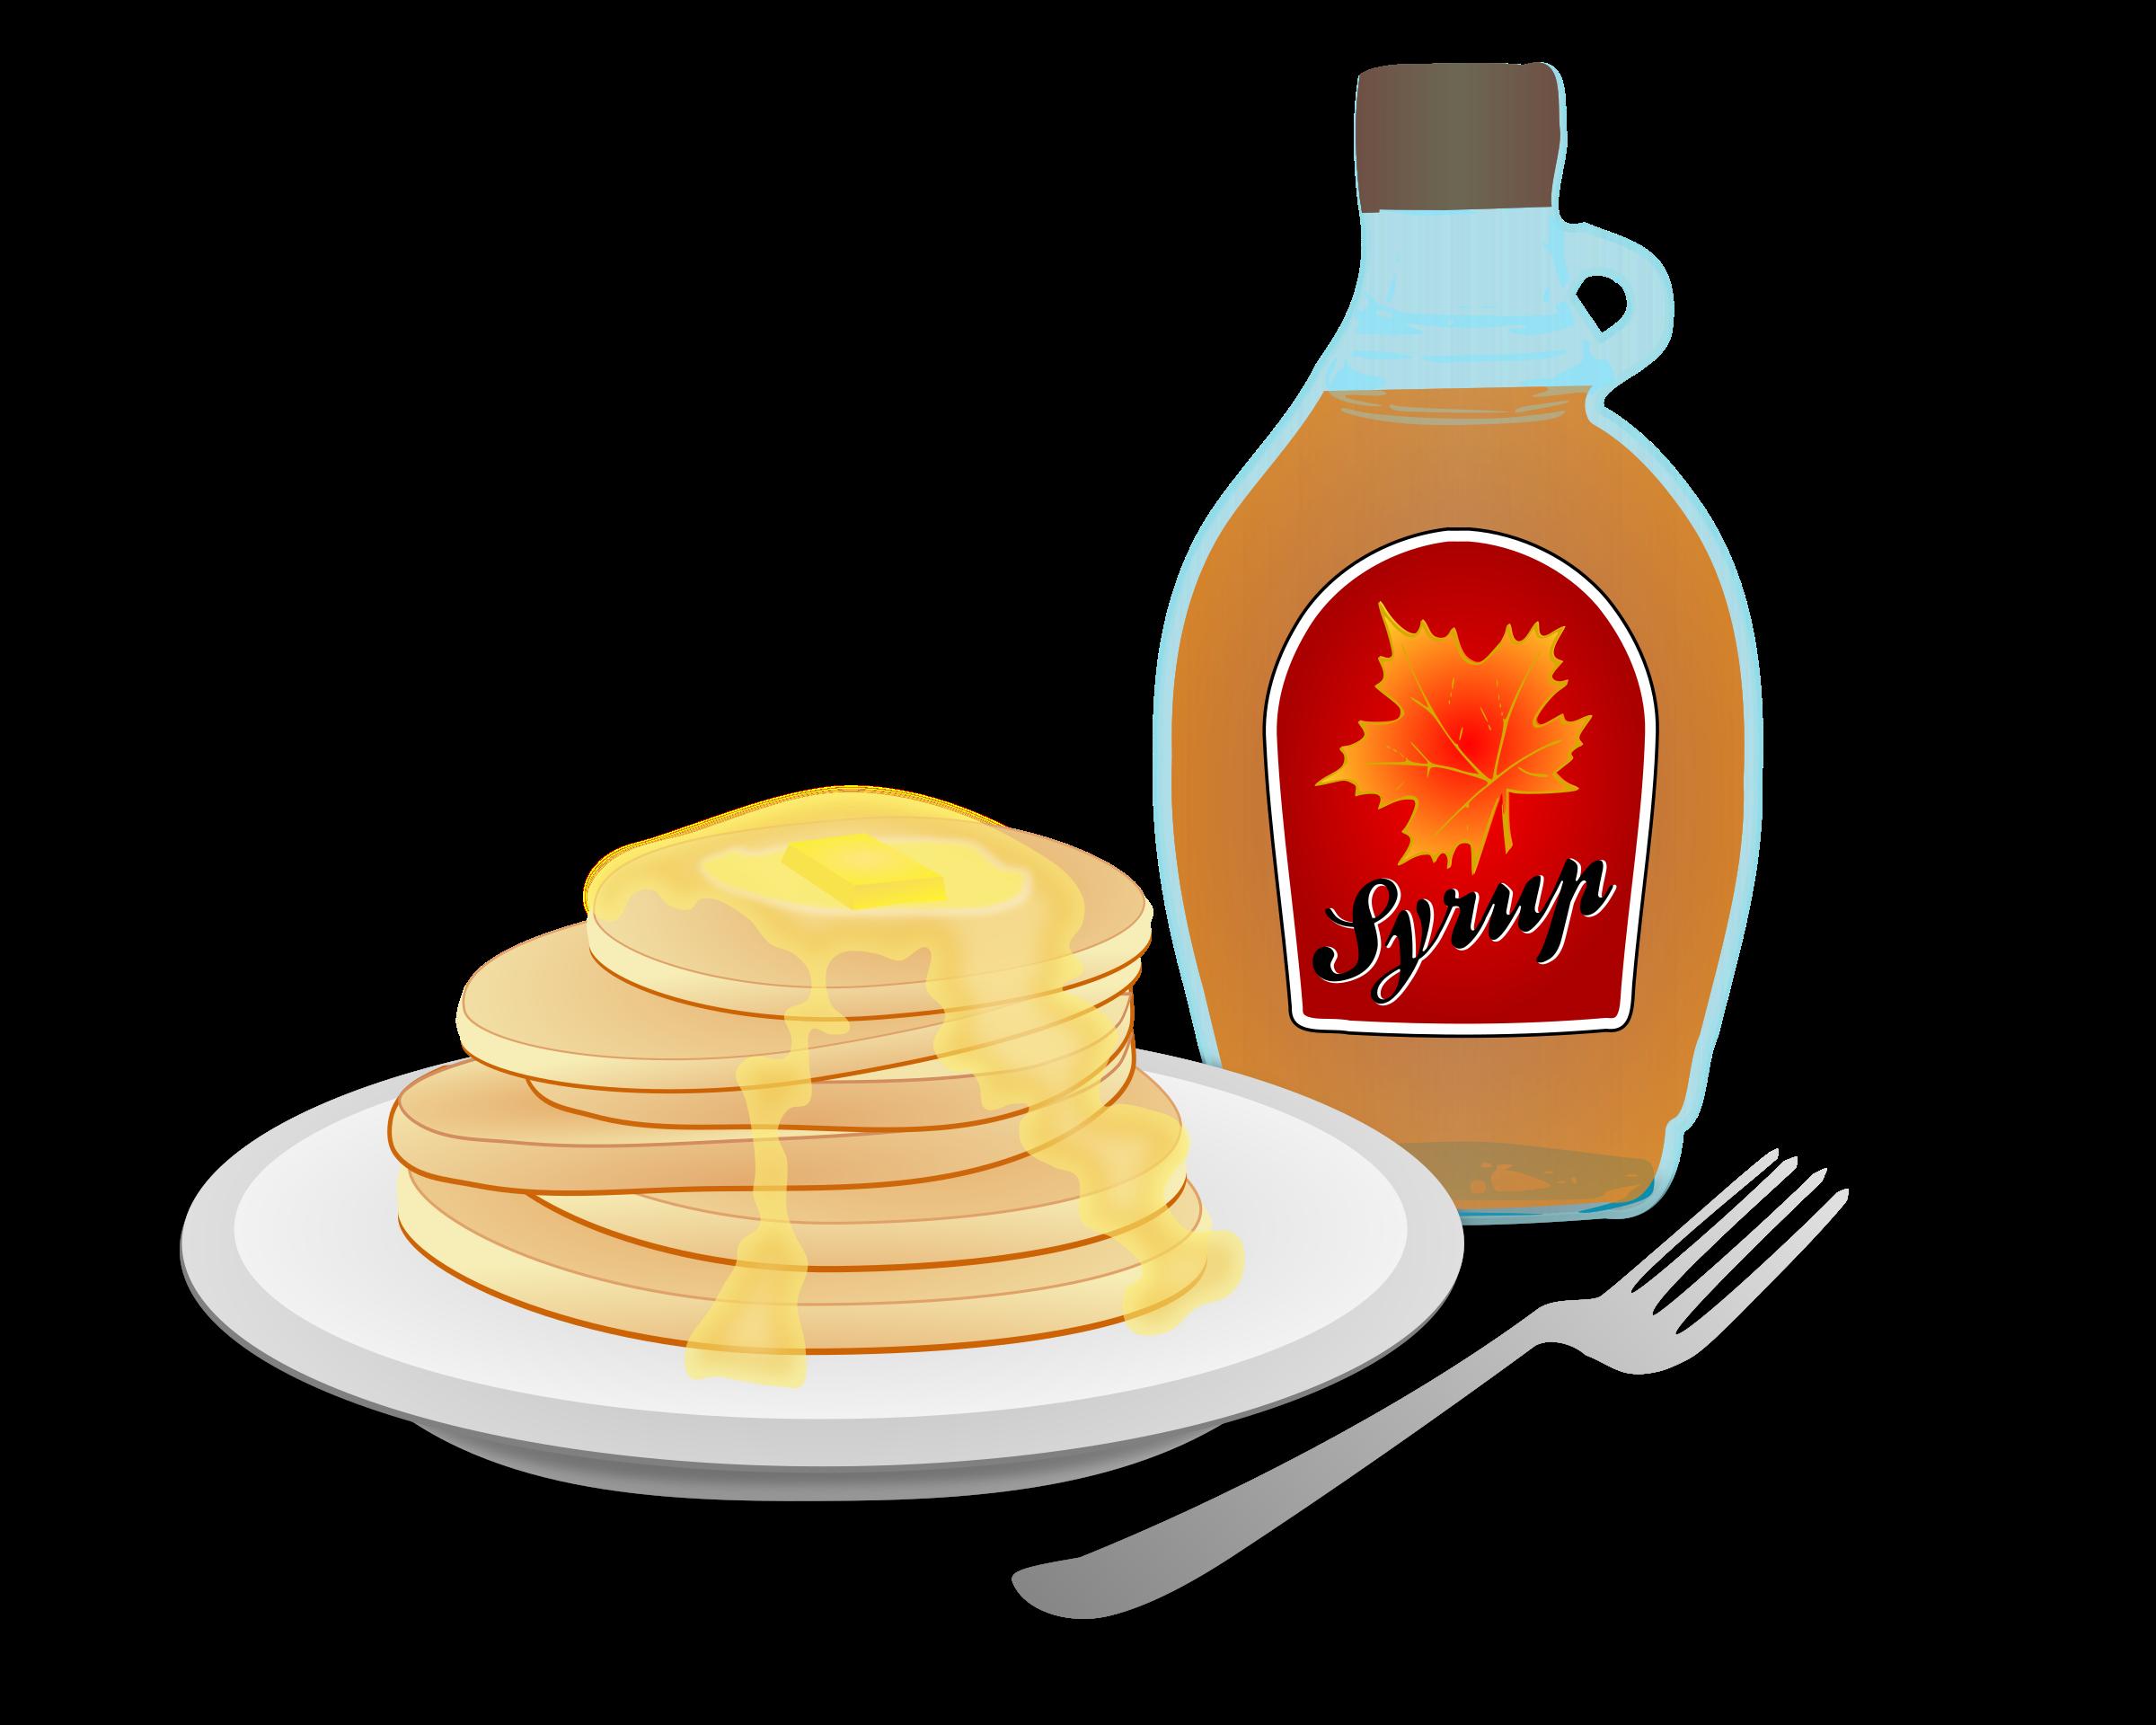 Pancakes cooked breakfast